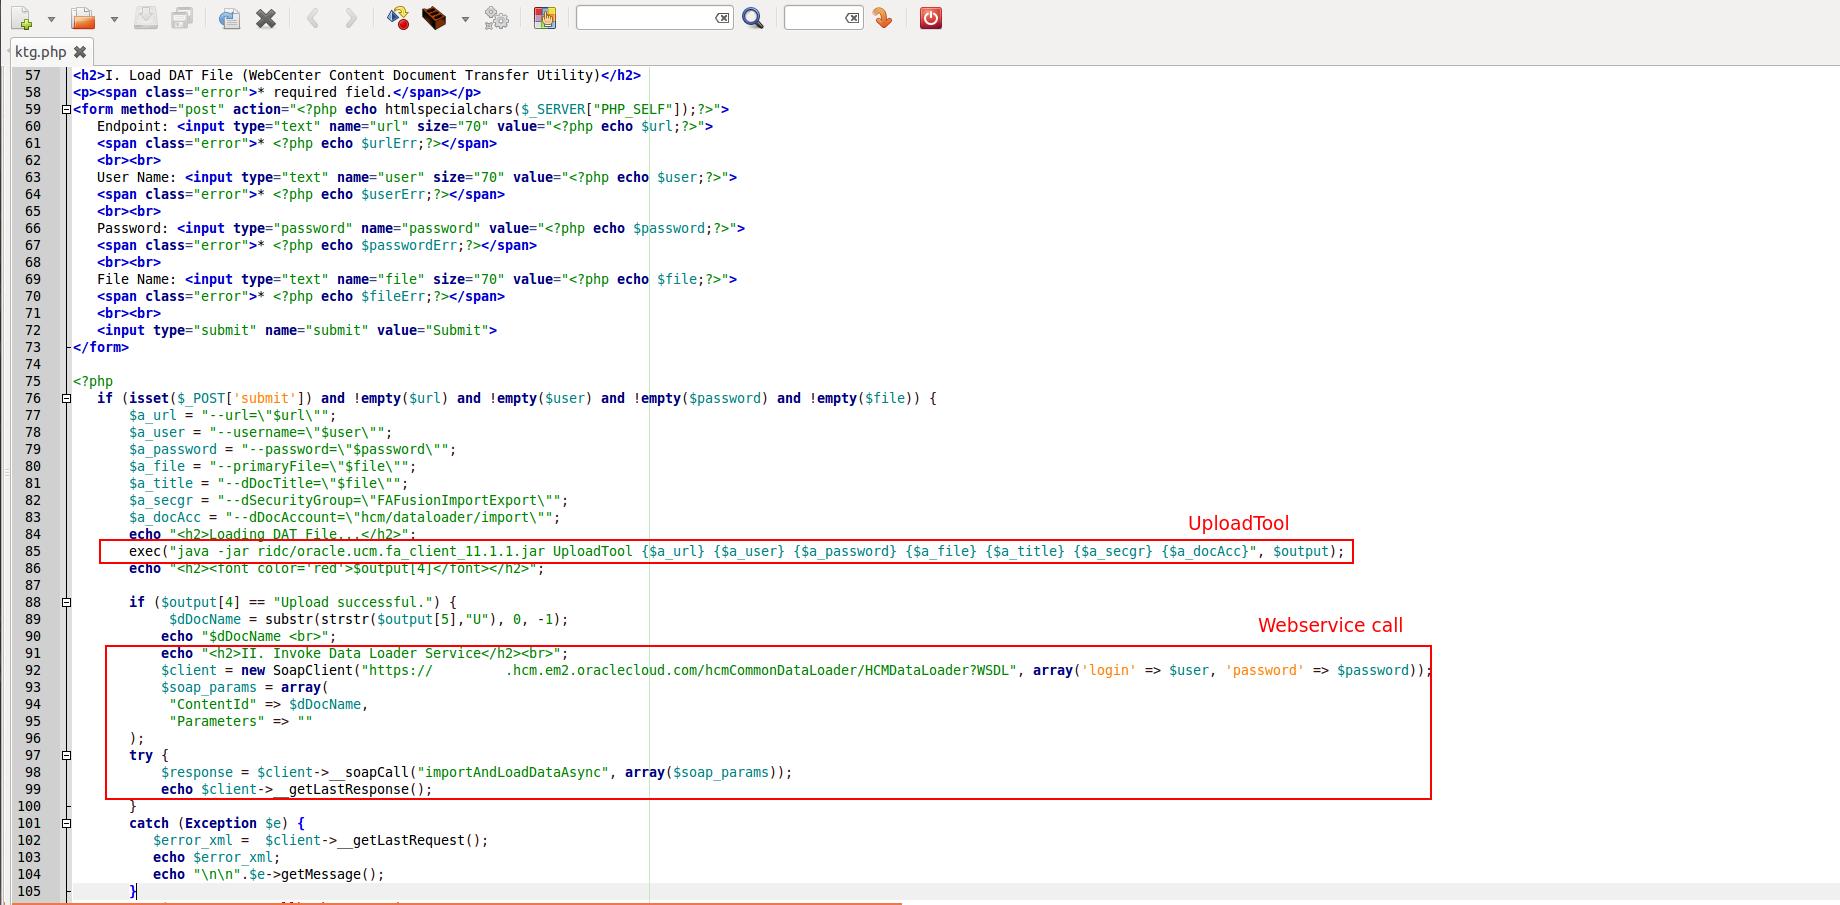 HCM Data Loader automation examples | HCM Cloud Hub